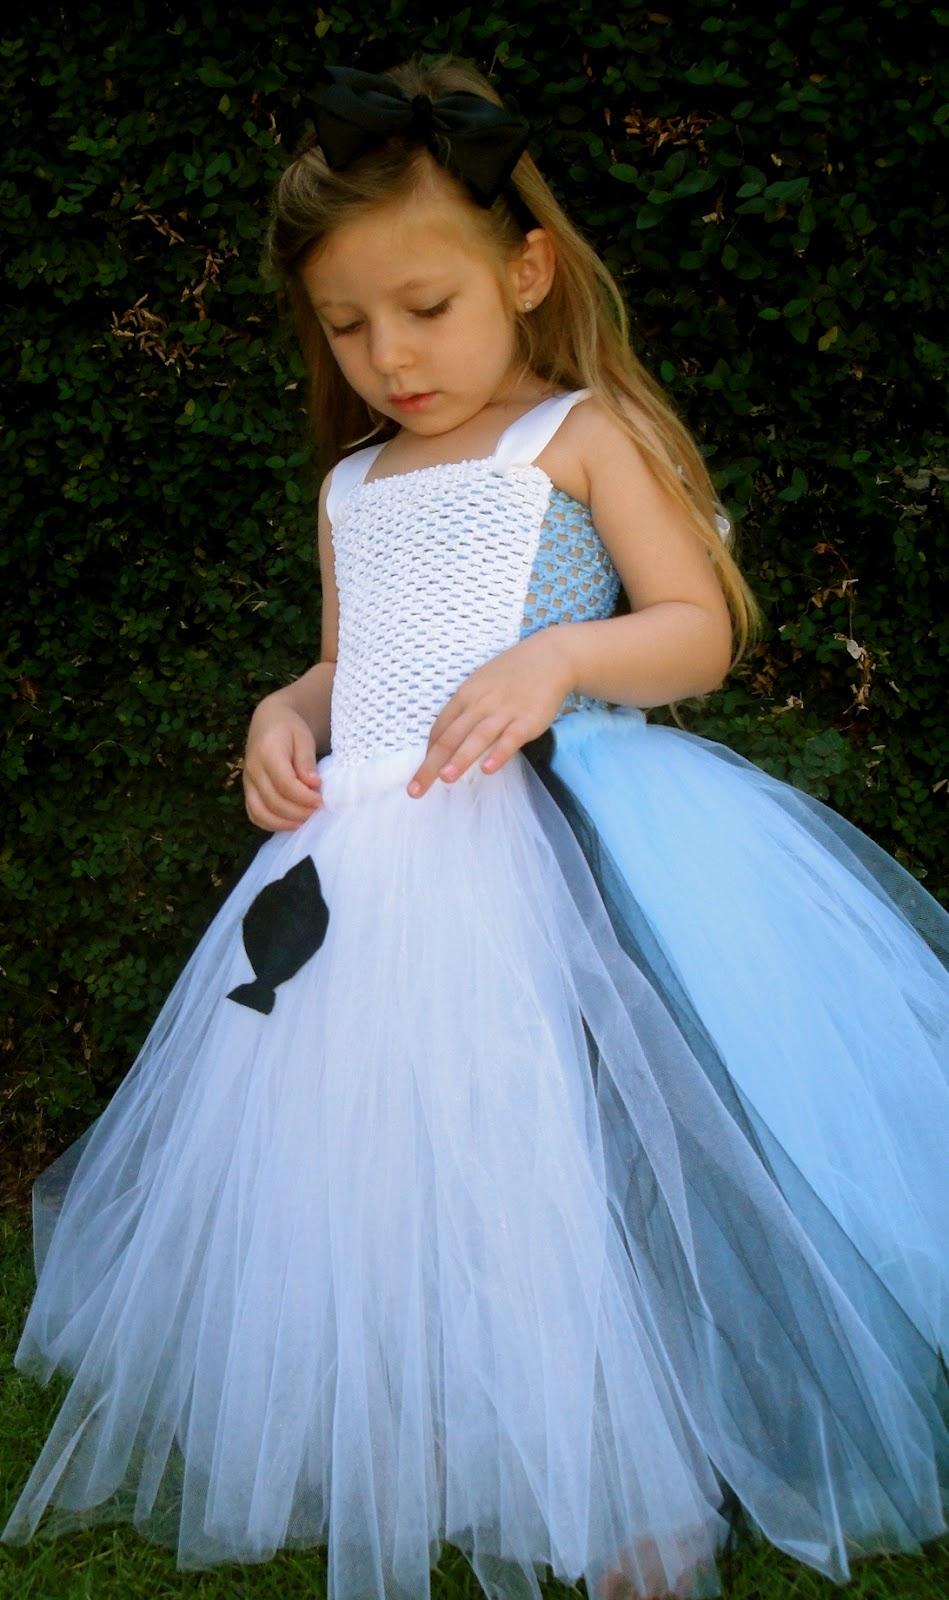 Hollywoodtutu Dresses Alice In Wonderland Tutu Dress With